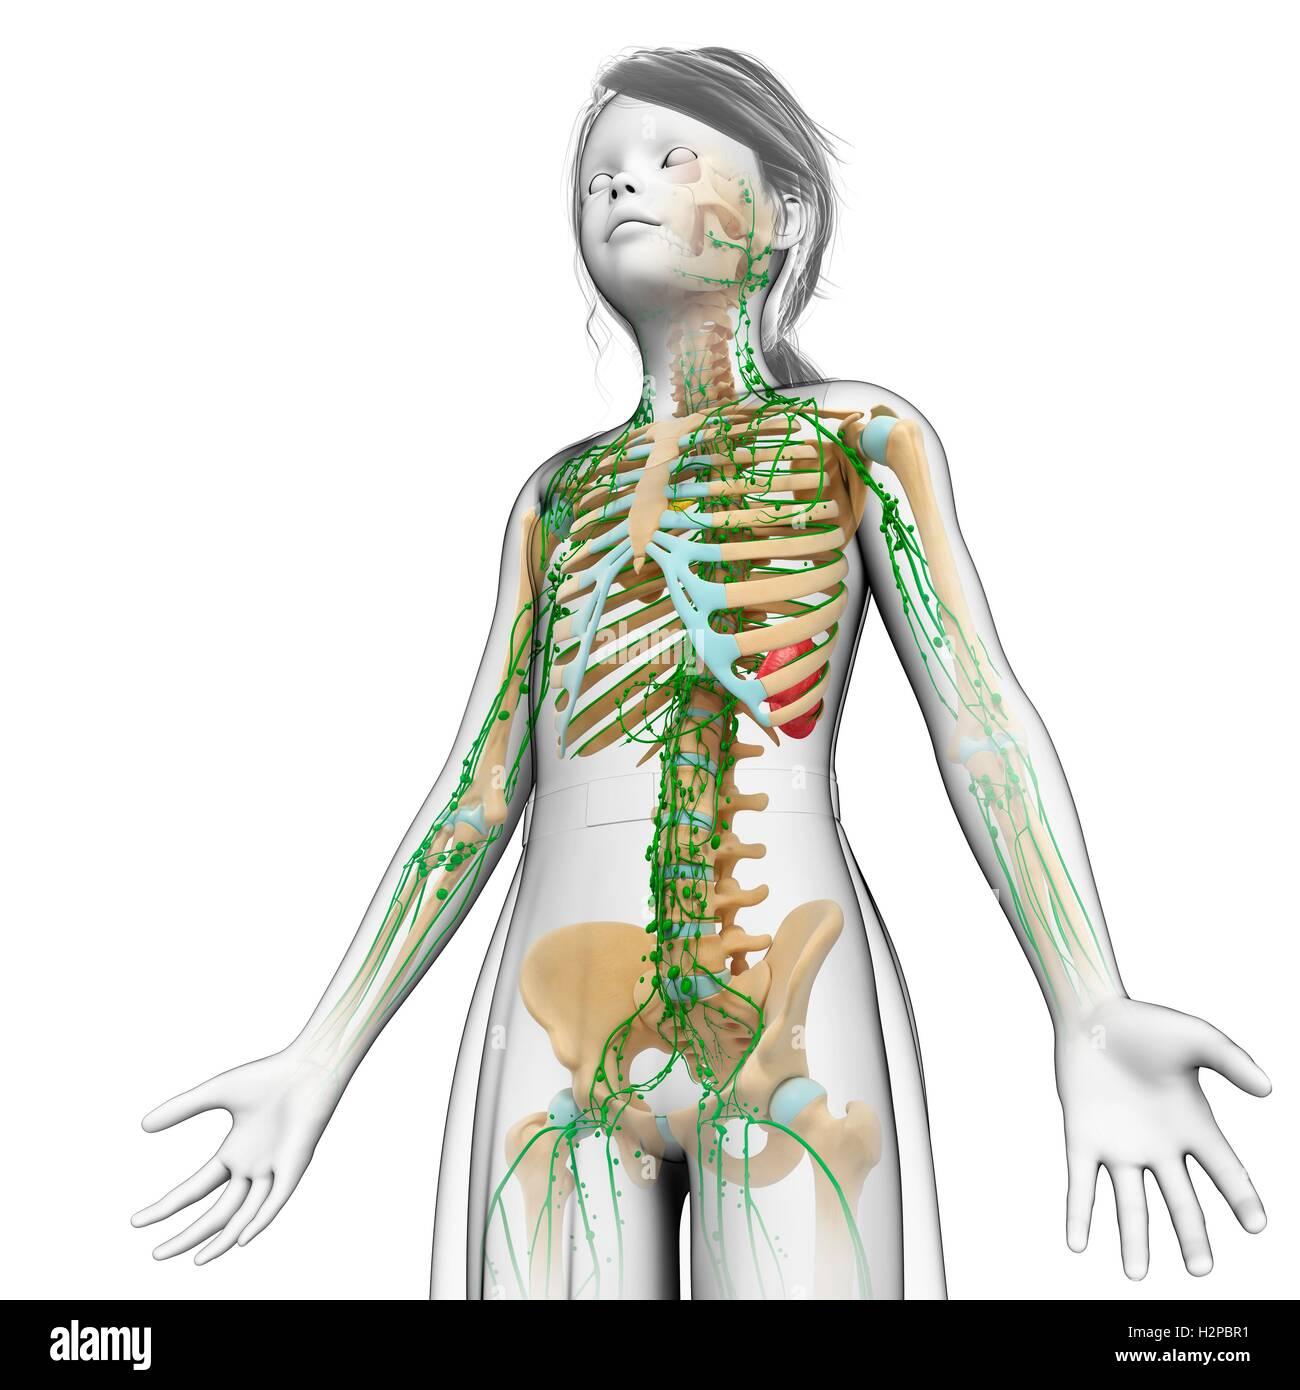 Skeletal System Stockfotos & Skeletal System Bilder - Seite 17 - Alamy